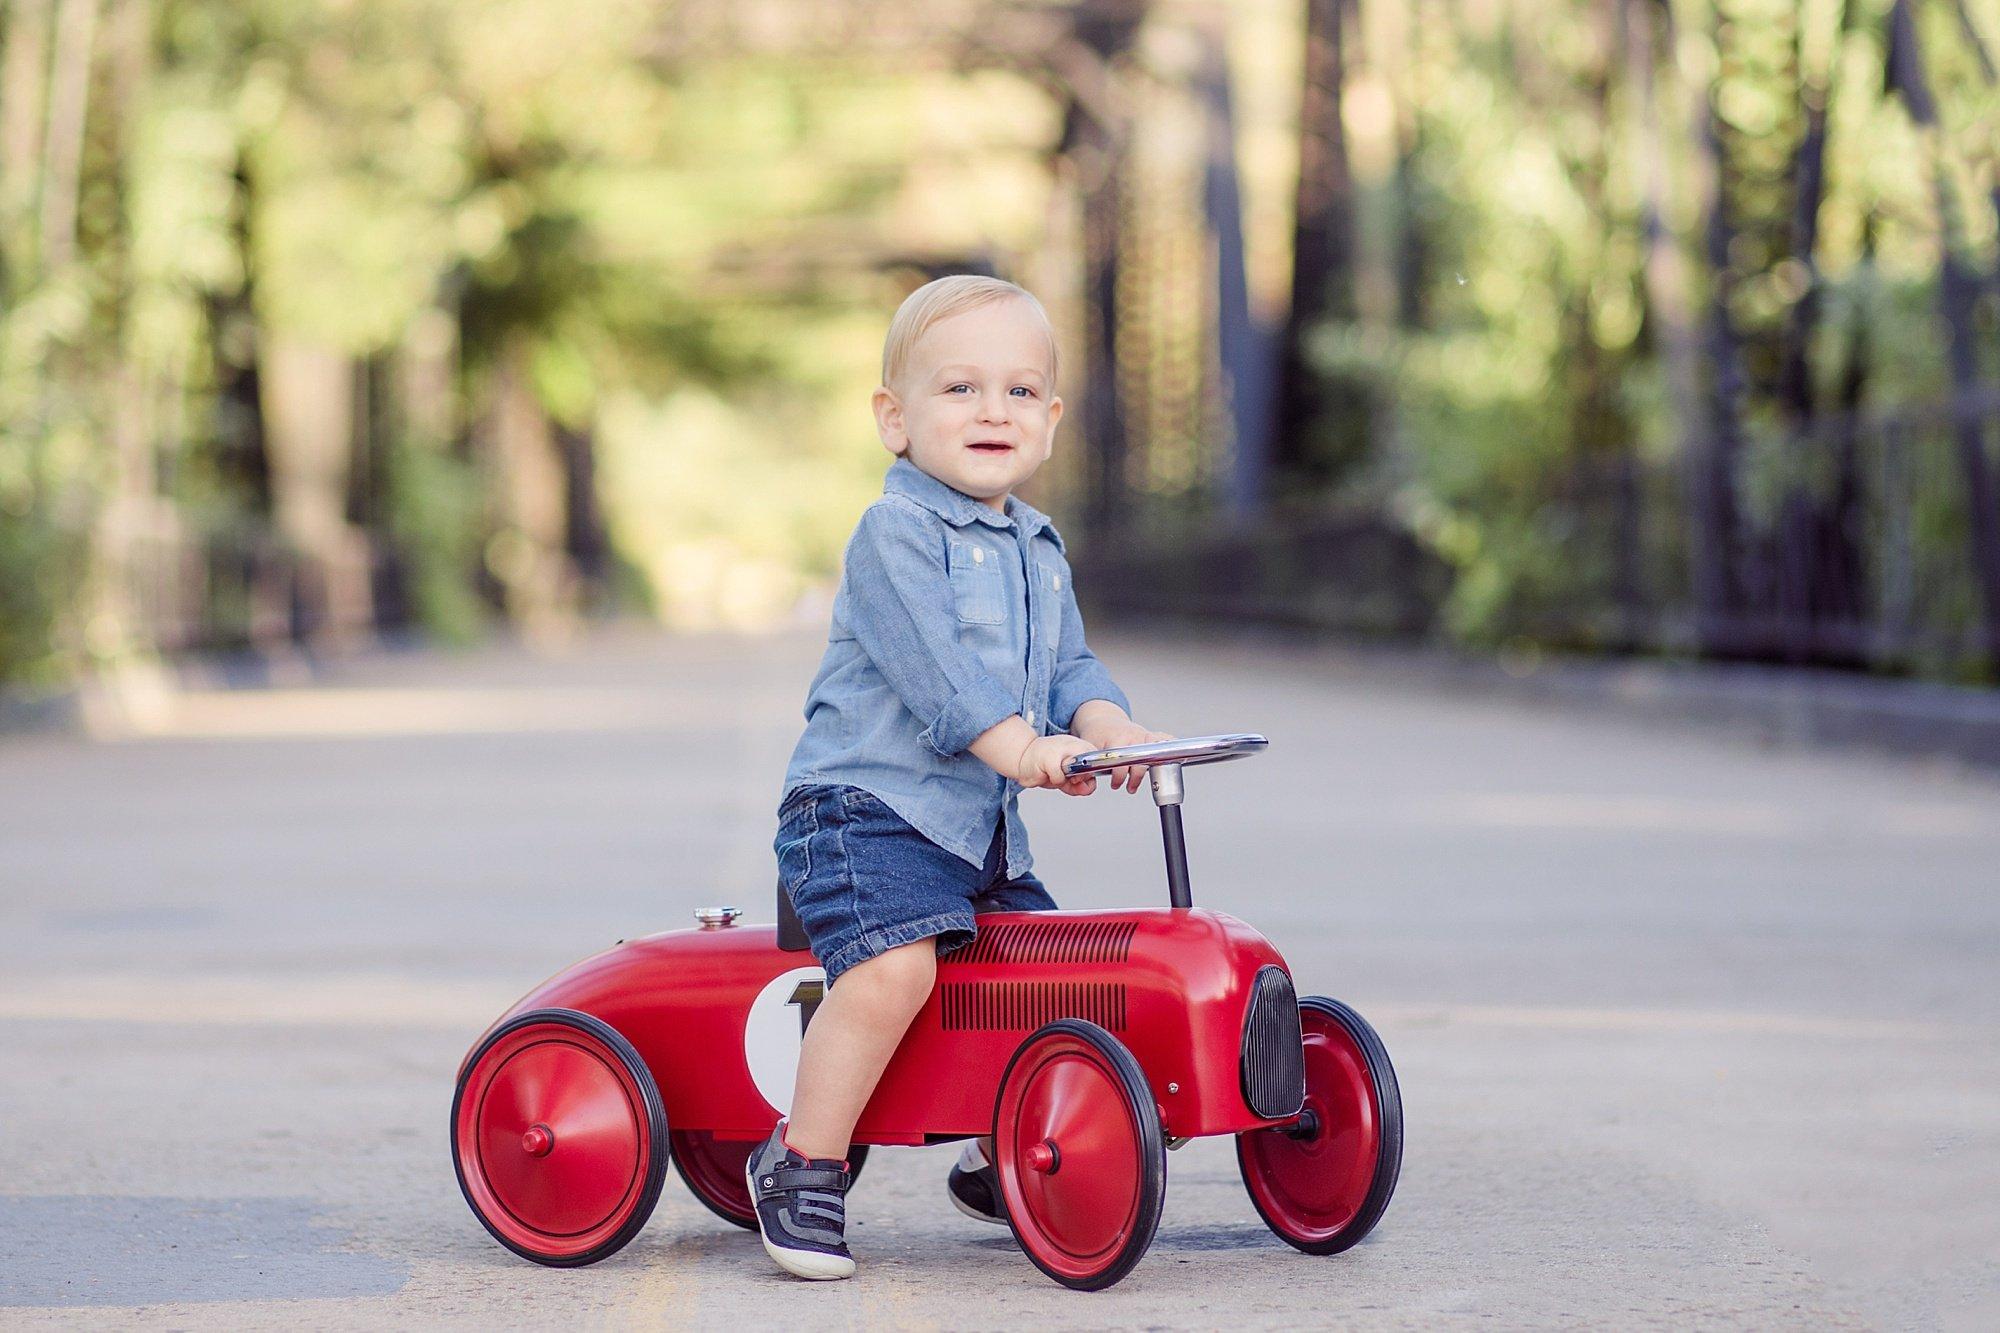 San Diego Child Photography | San Diego Photography